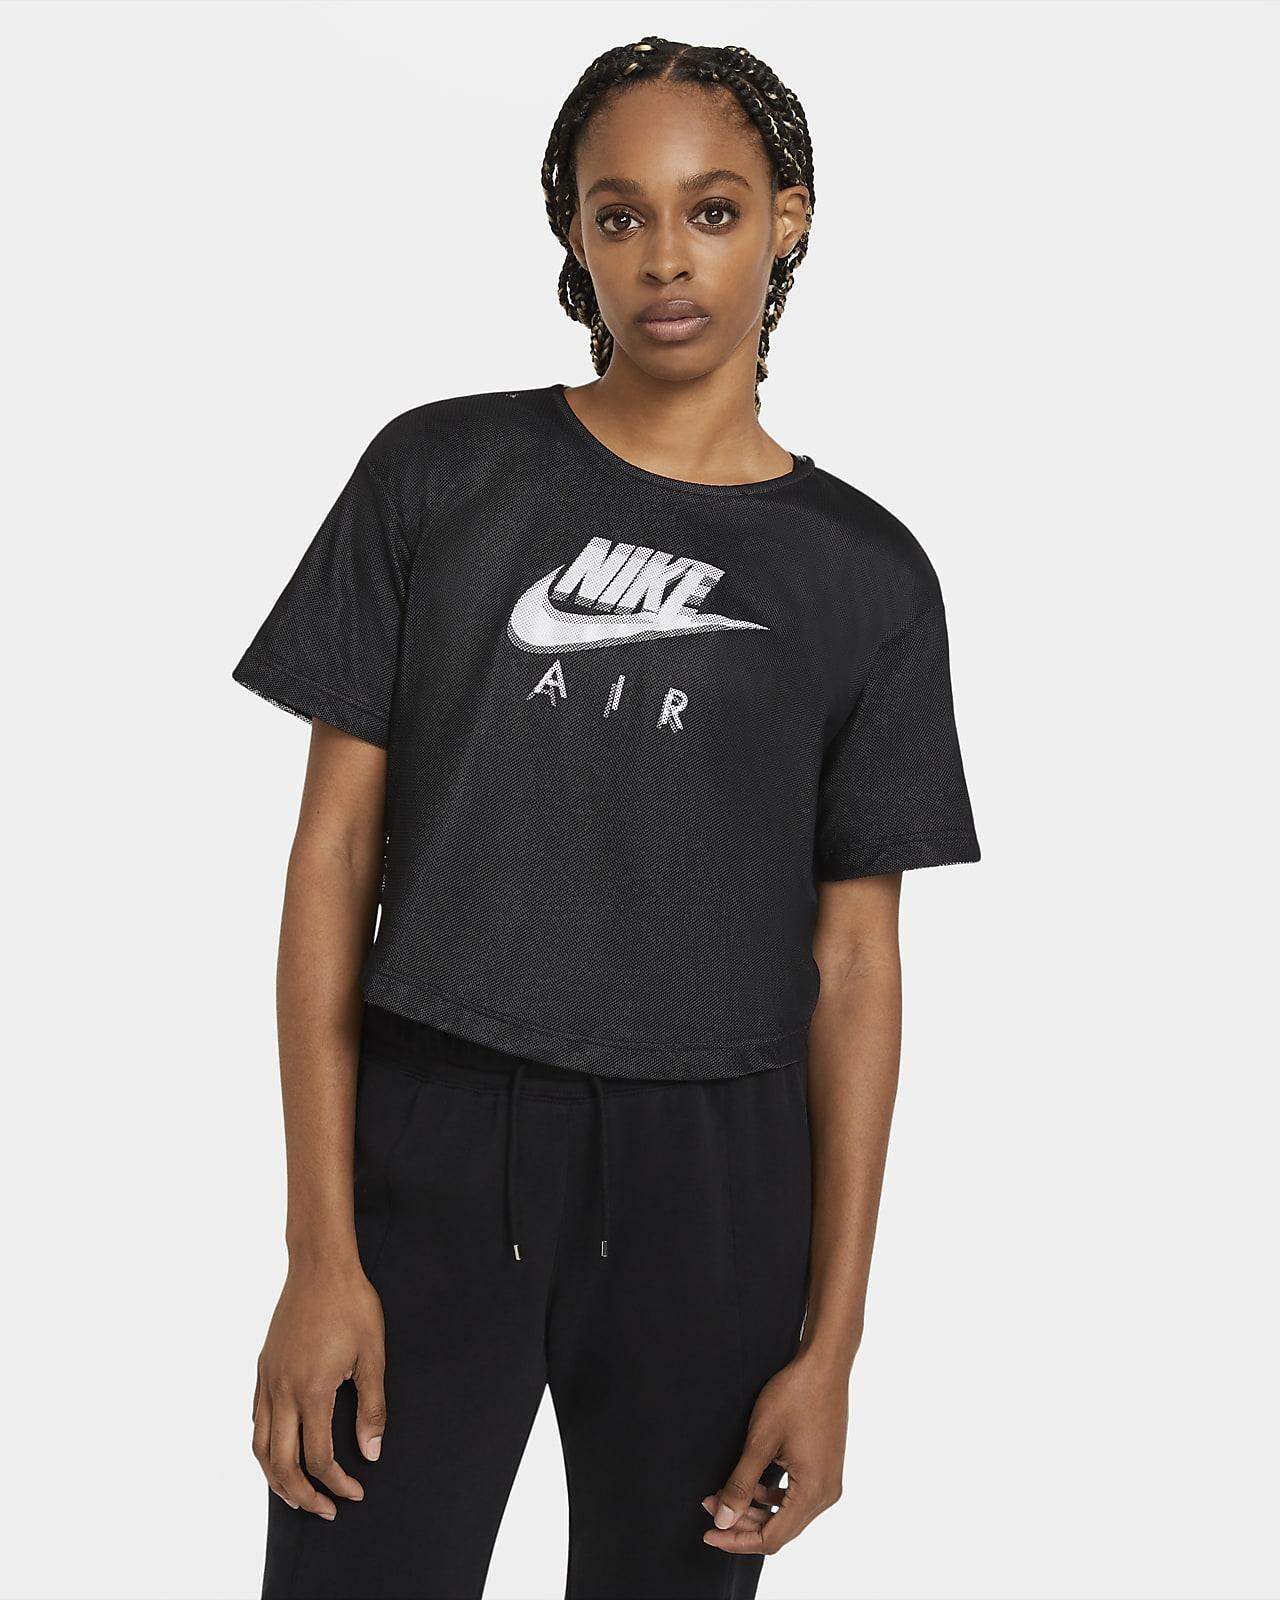 Nike Air Women's Mesh Short-Sleeve Top